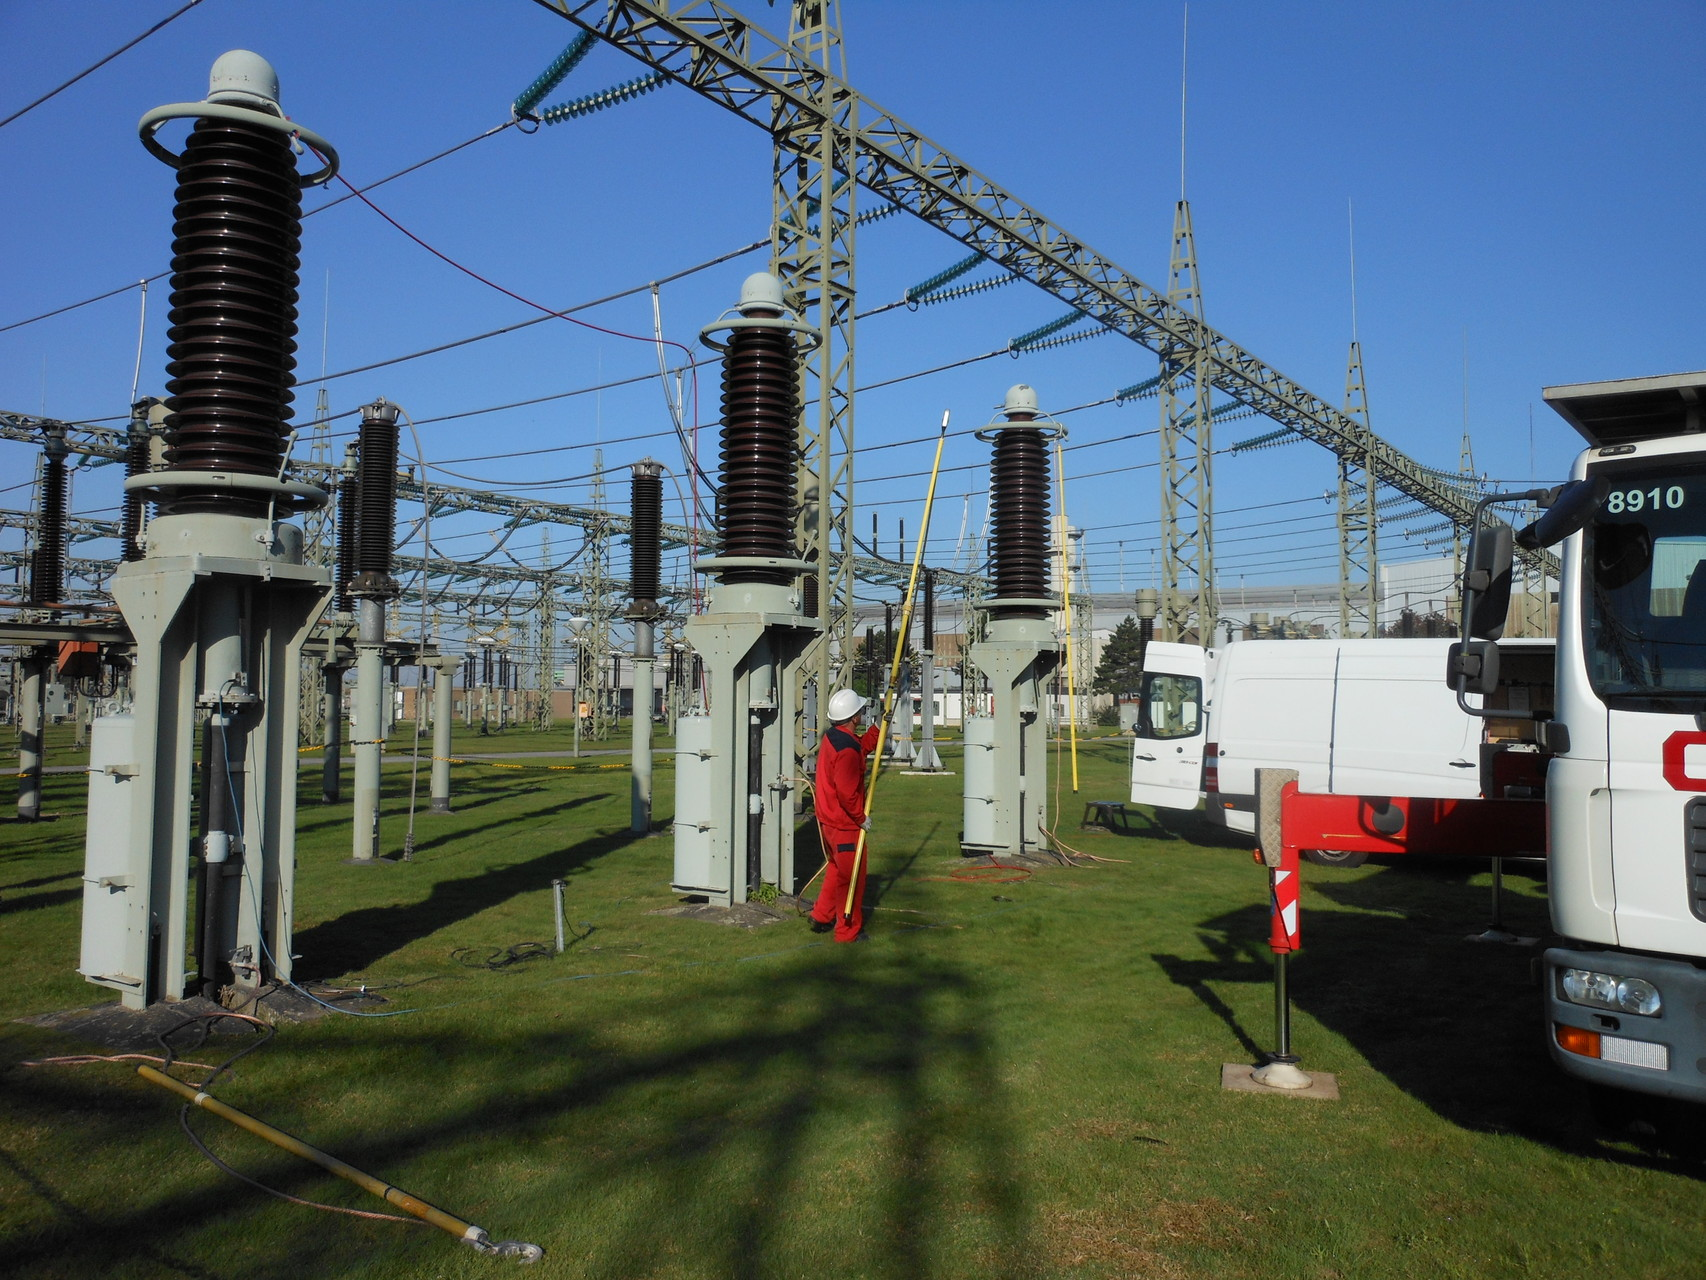 Alterungsdiagnose am 220 kV-Ölkabel (ca. 850 m) von 1961